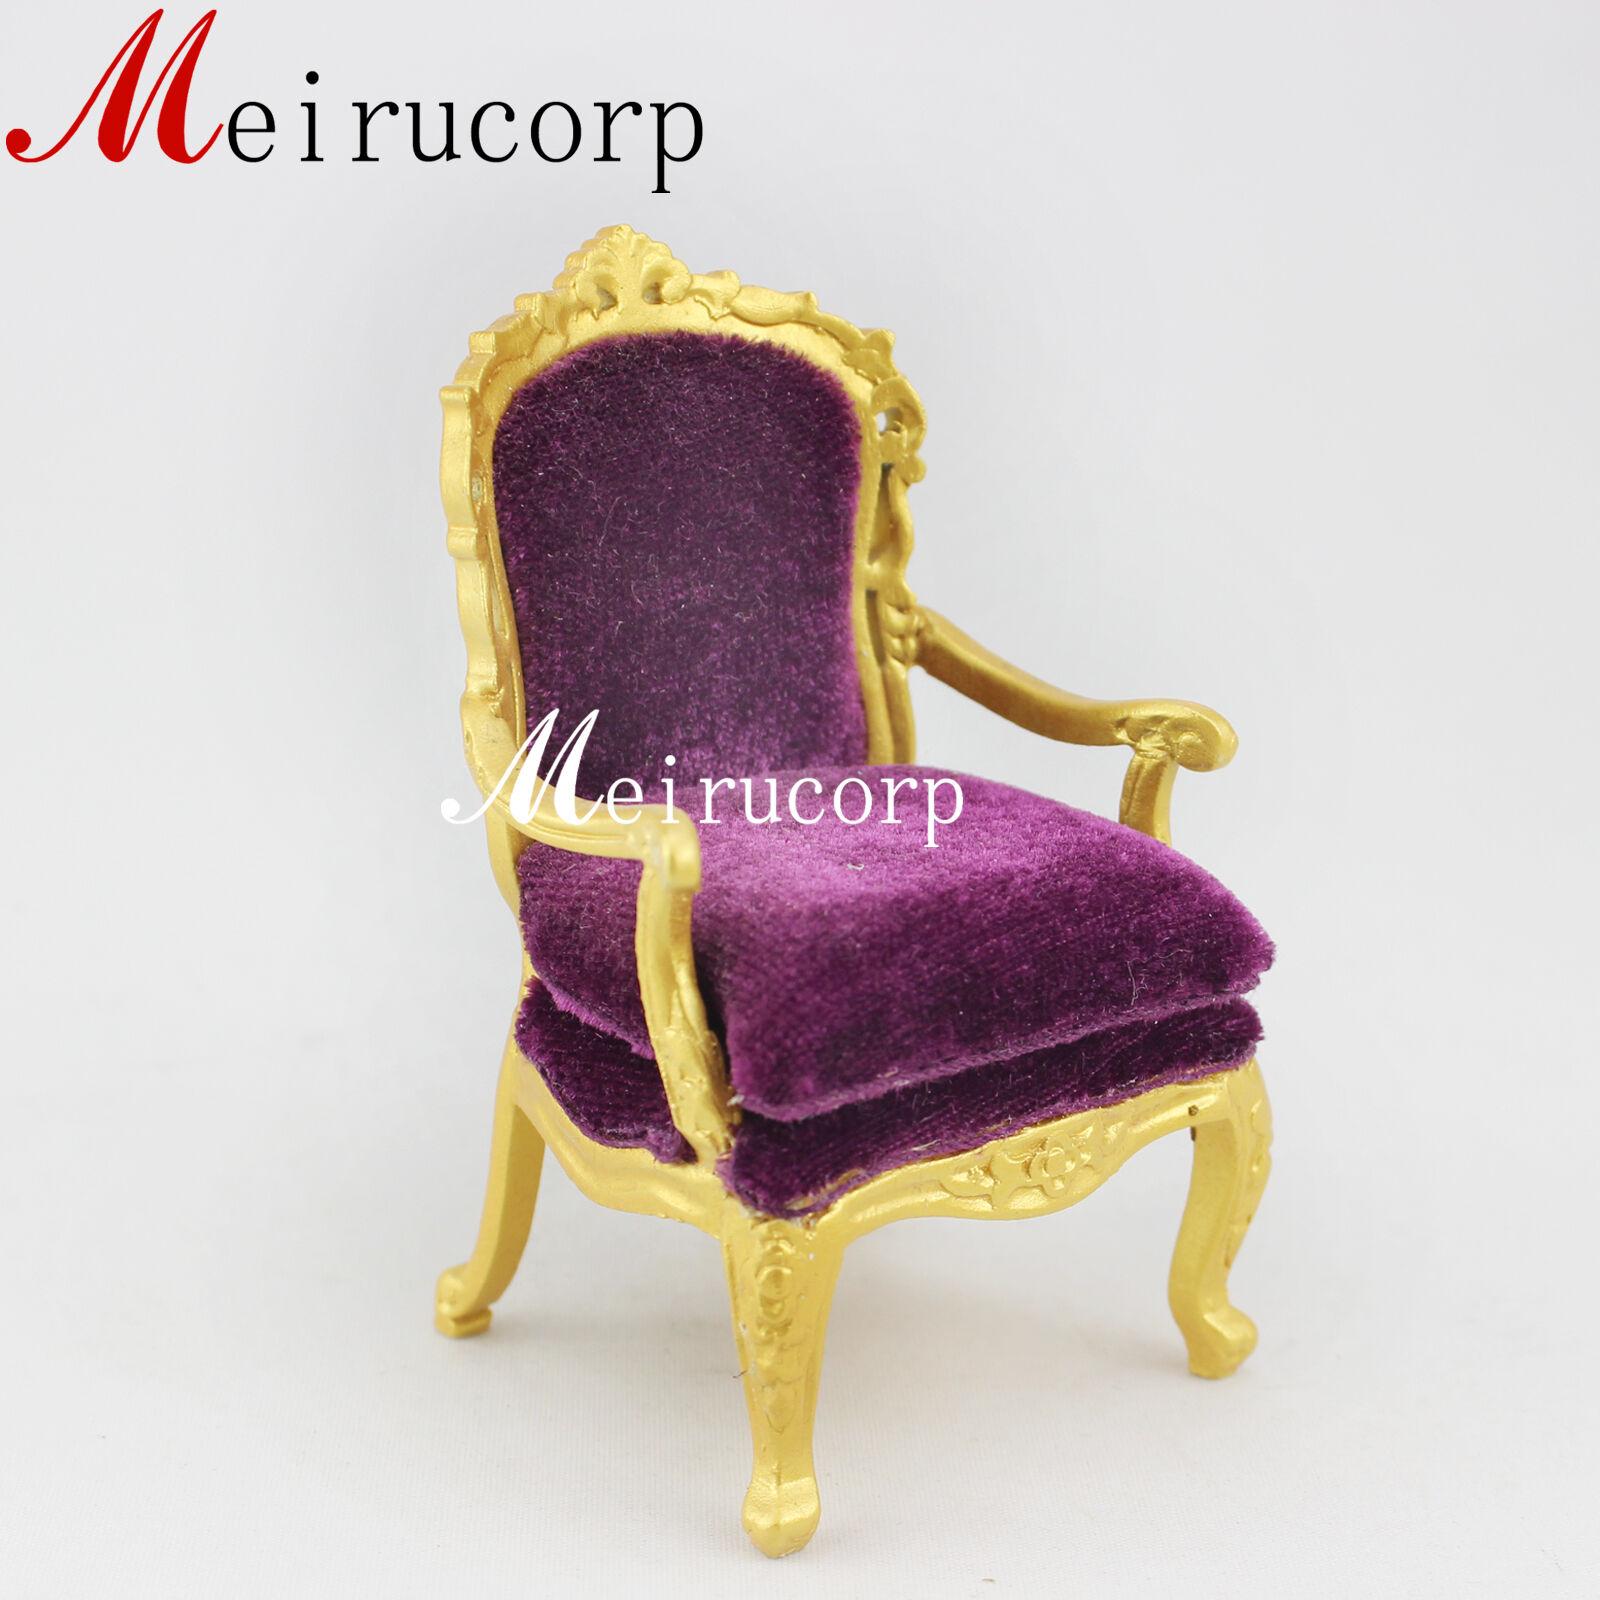 Dollhouse Miniature JBM Chair Regency Dressing or Side 1:12 Scale Furniture